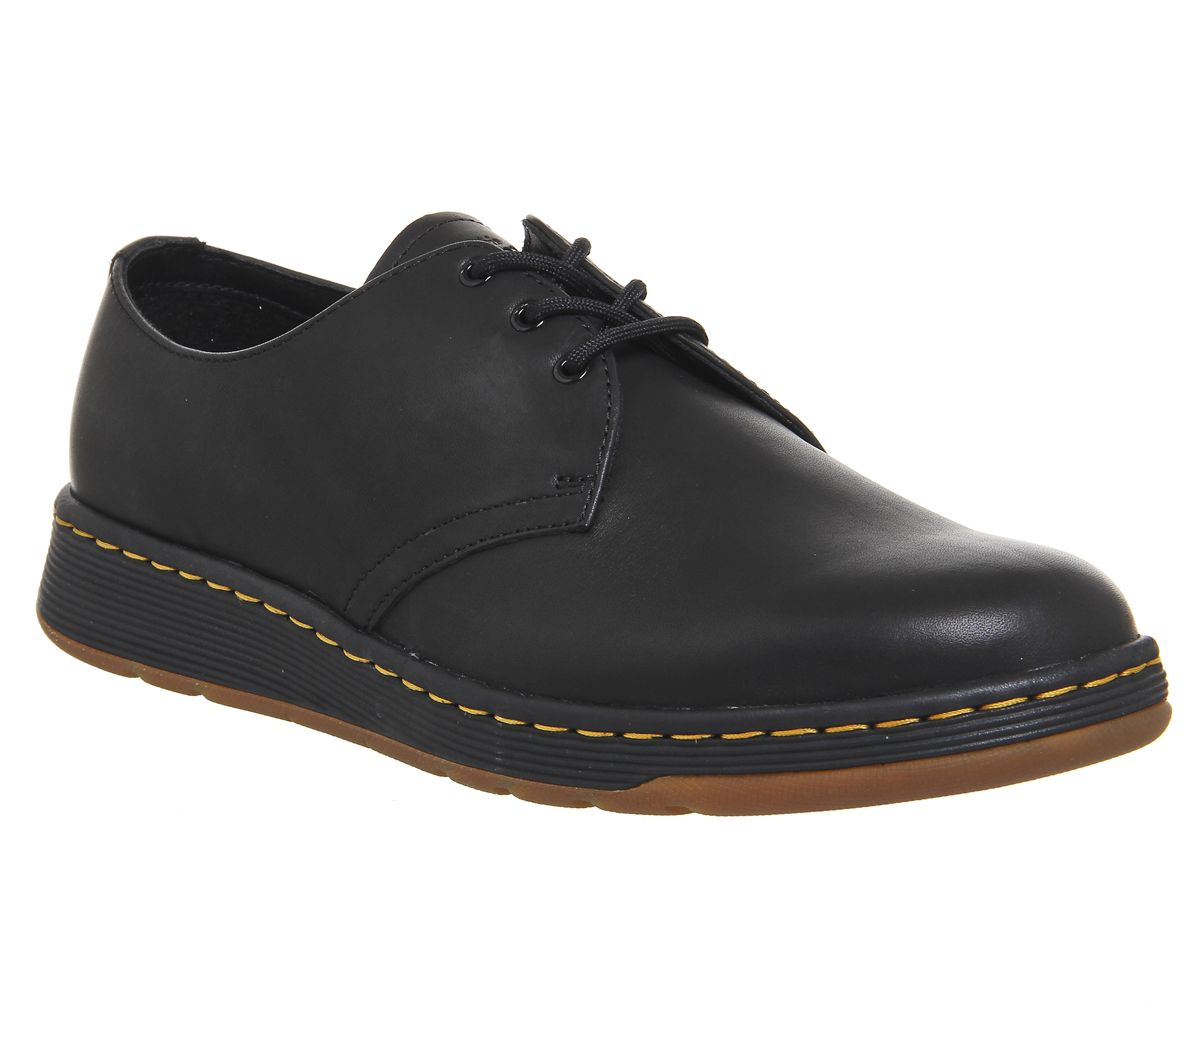 Cavendish 3 Eye Shoe